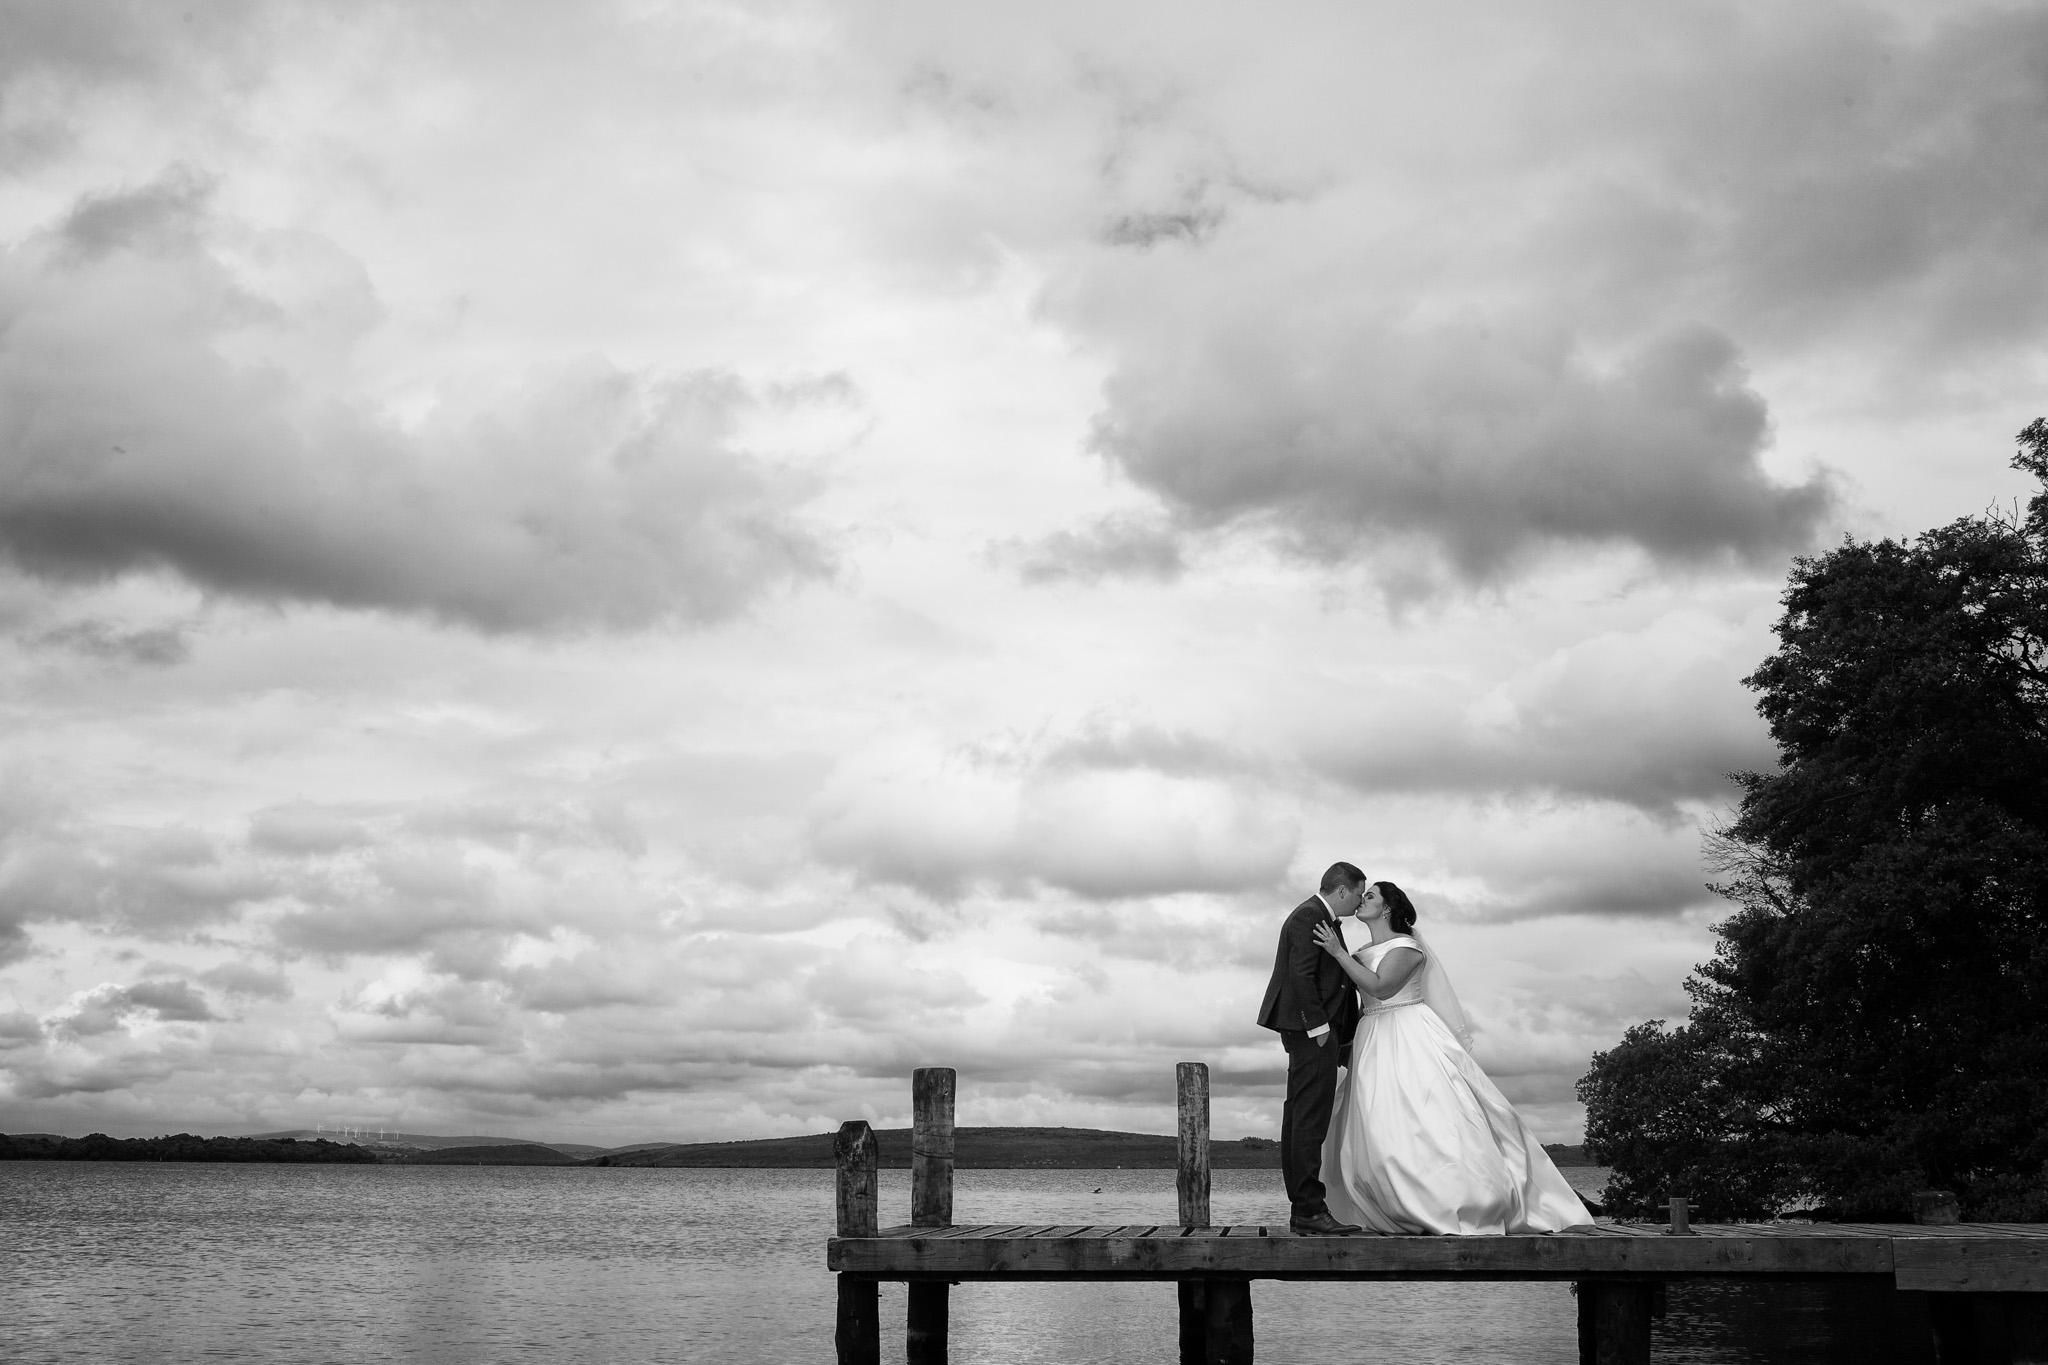 Mark_Barnes_Northern_Ireland_Wedding_Photography_Lusty_Beg_Wedding_Photography_Hayley&Brian-25.jpg